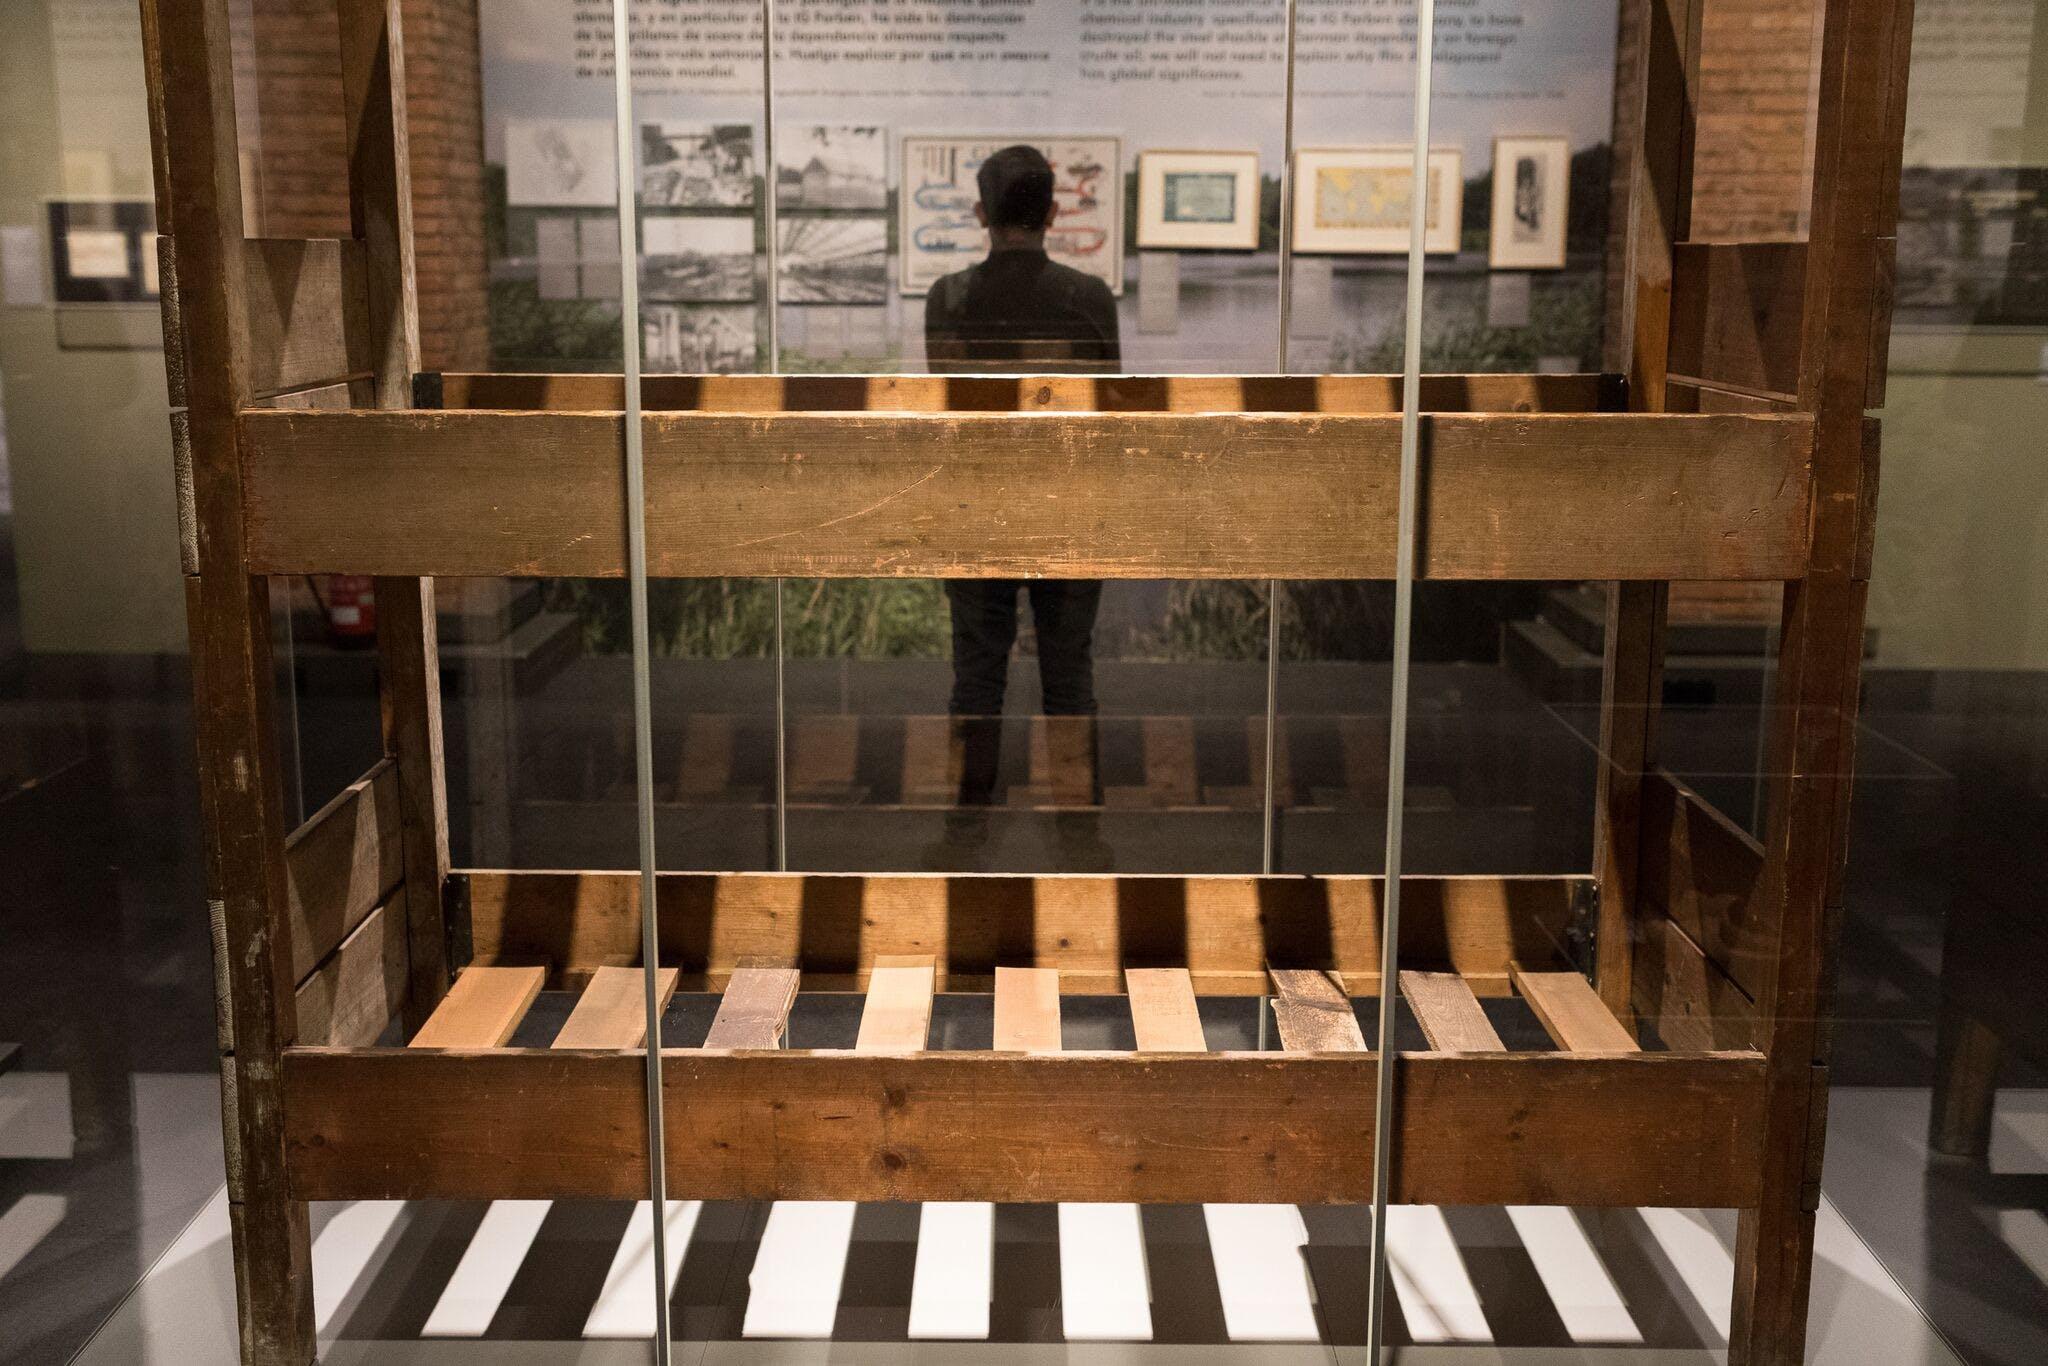 Auschwitz exposición Madrid 1 jpeg